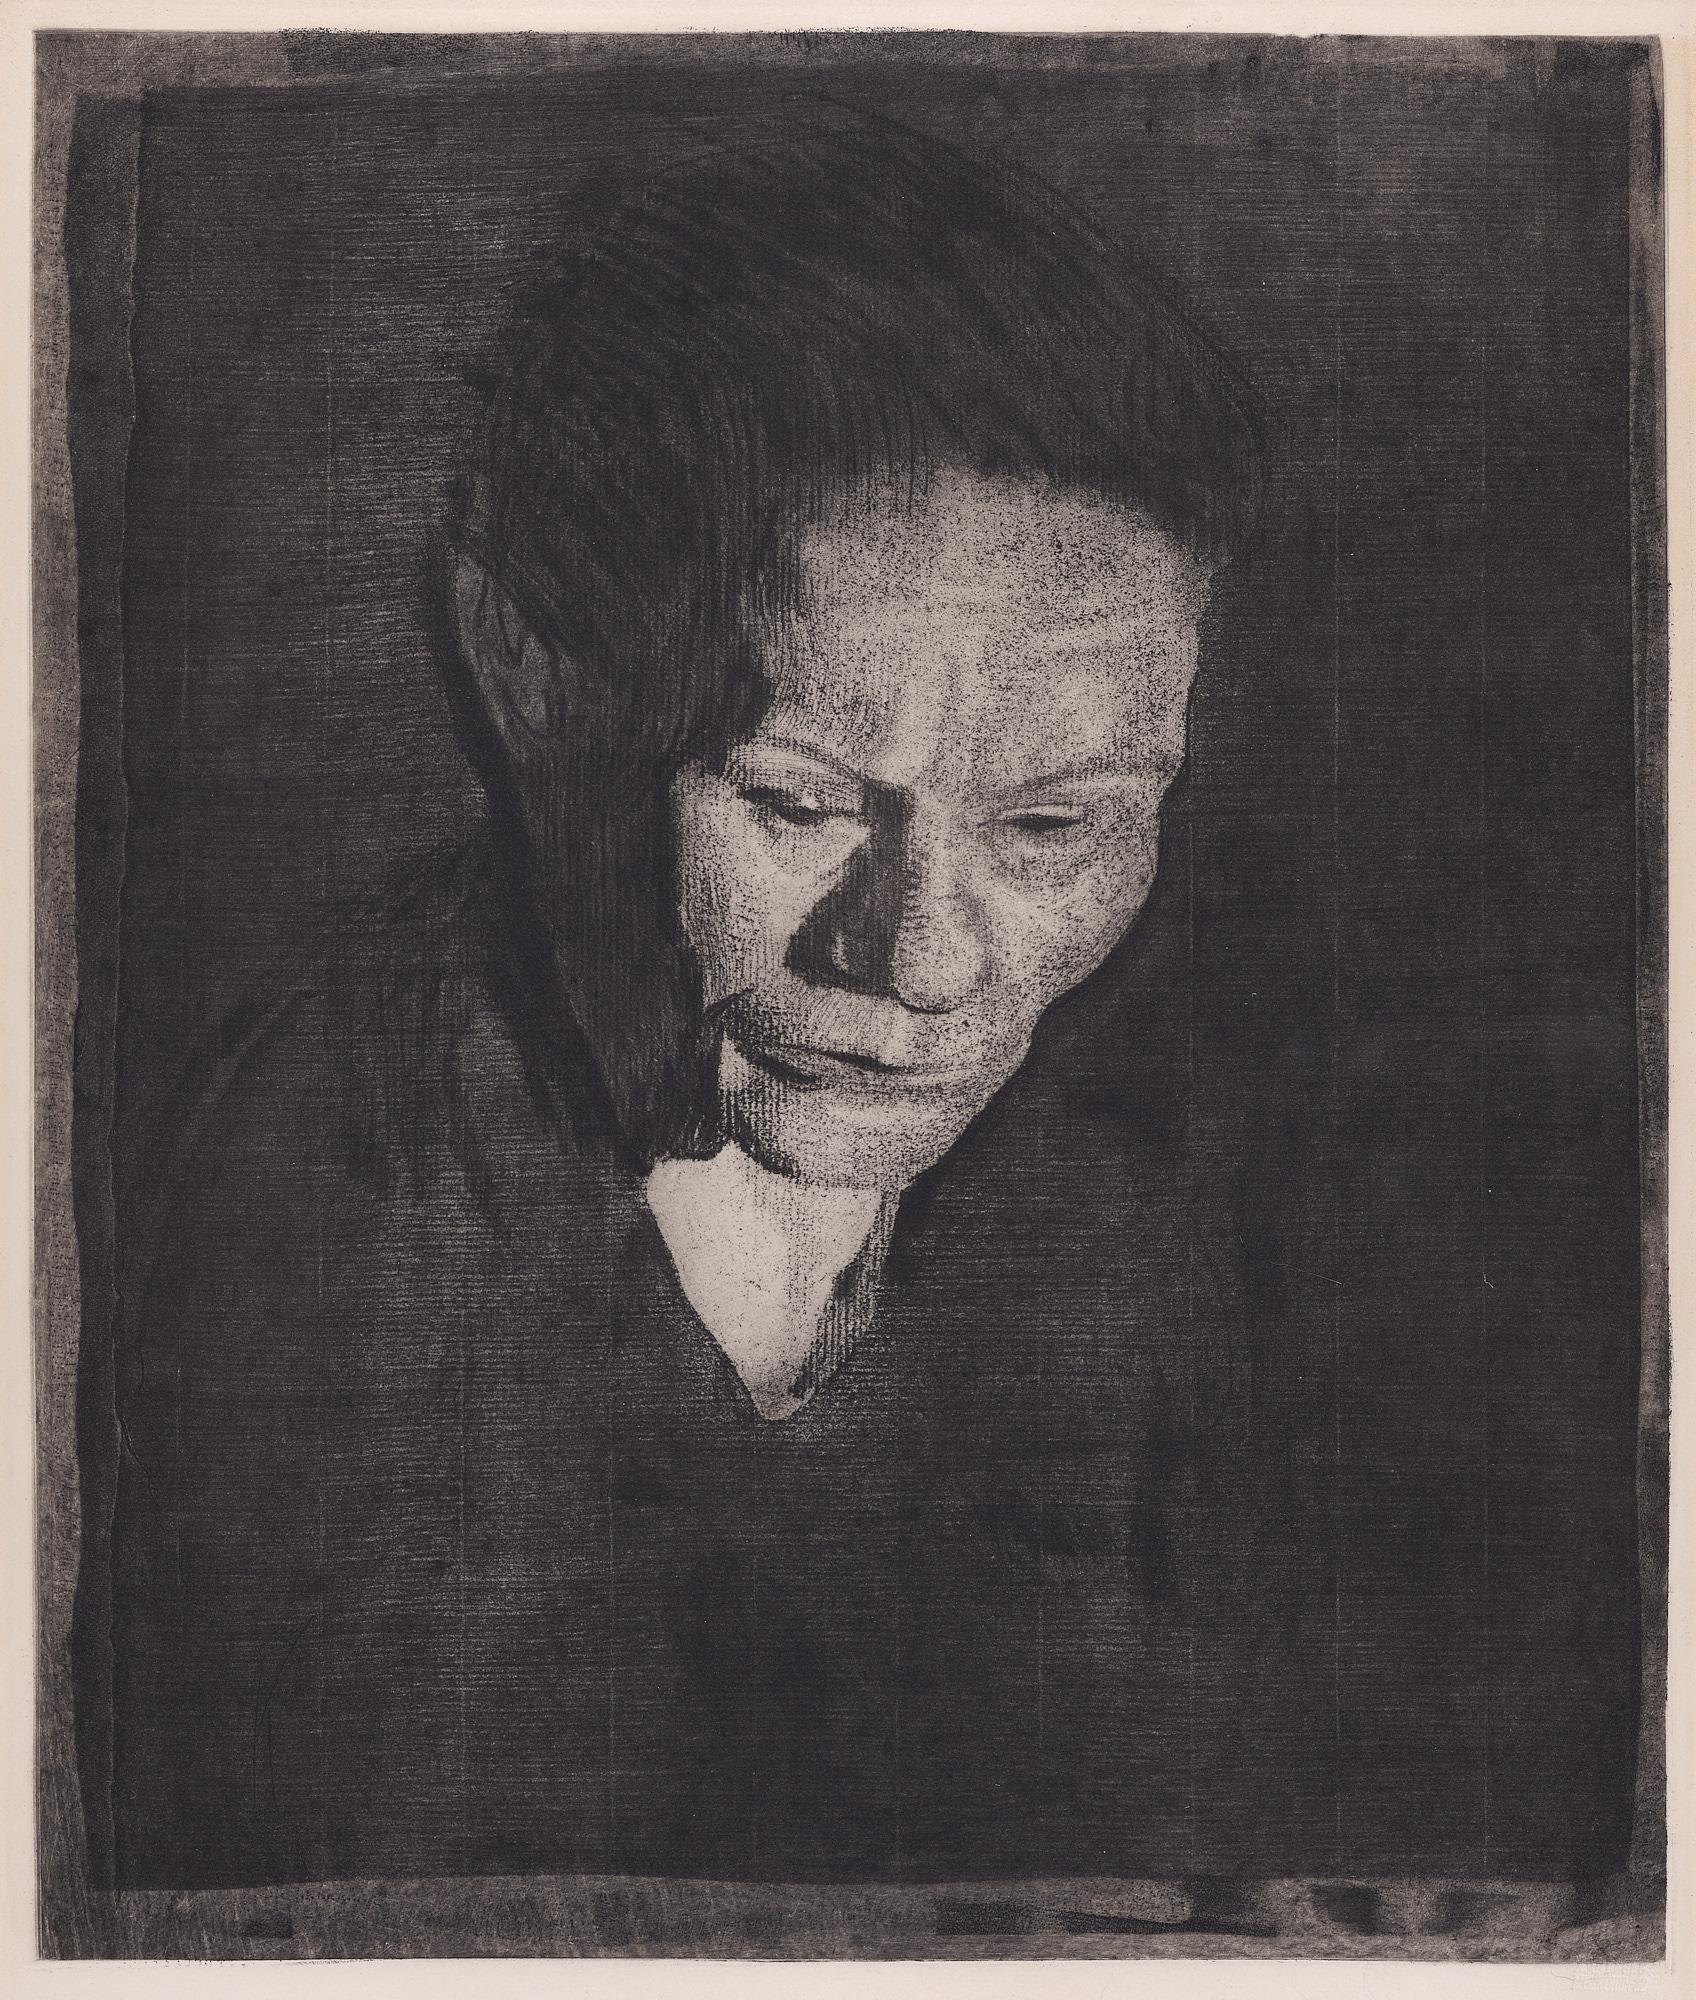 Kathe Kollwitz (1867-1945)